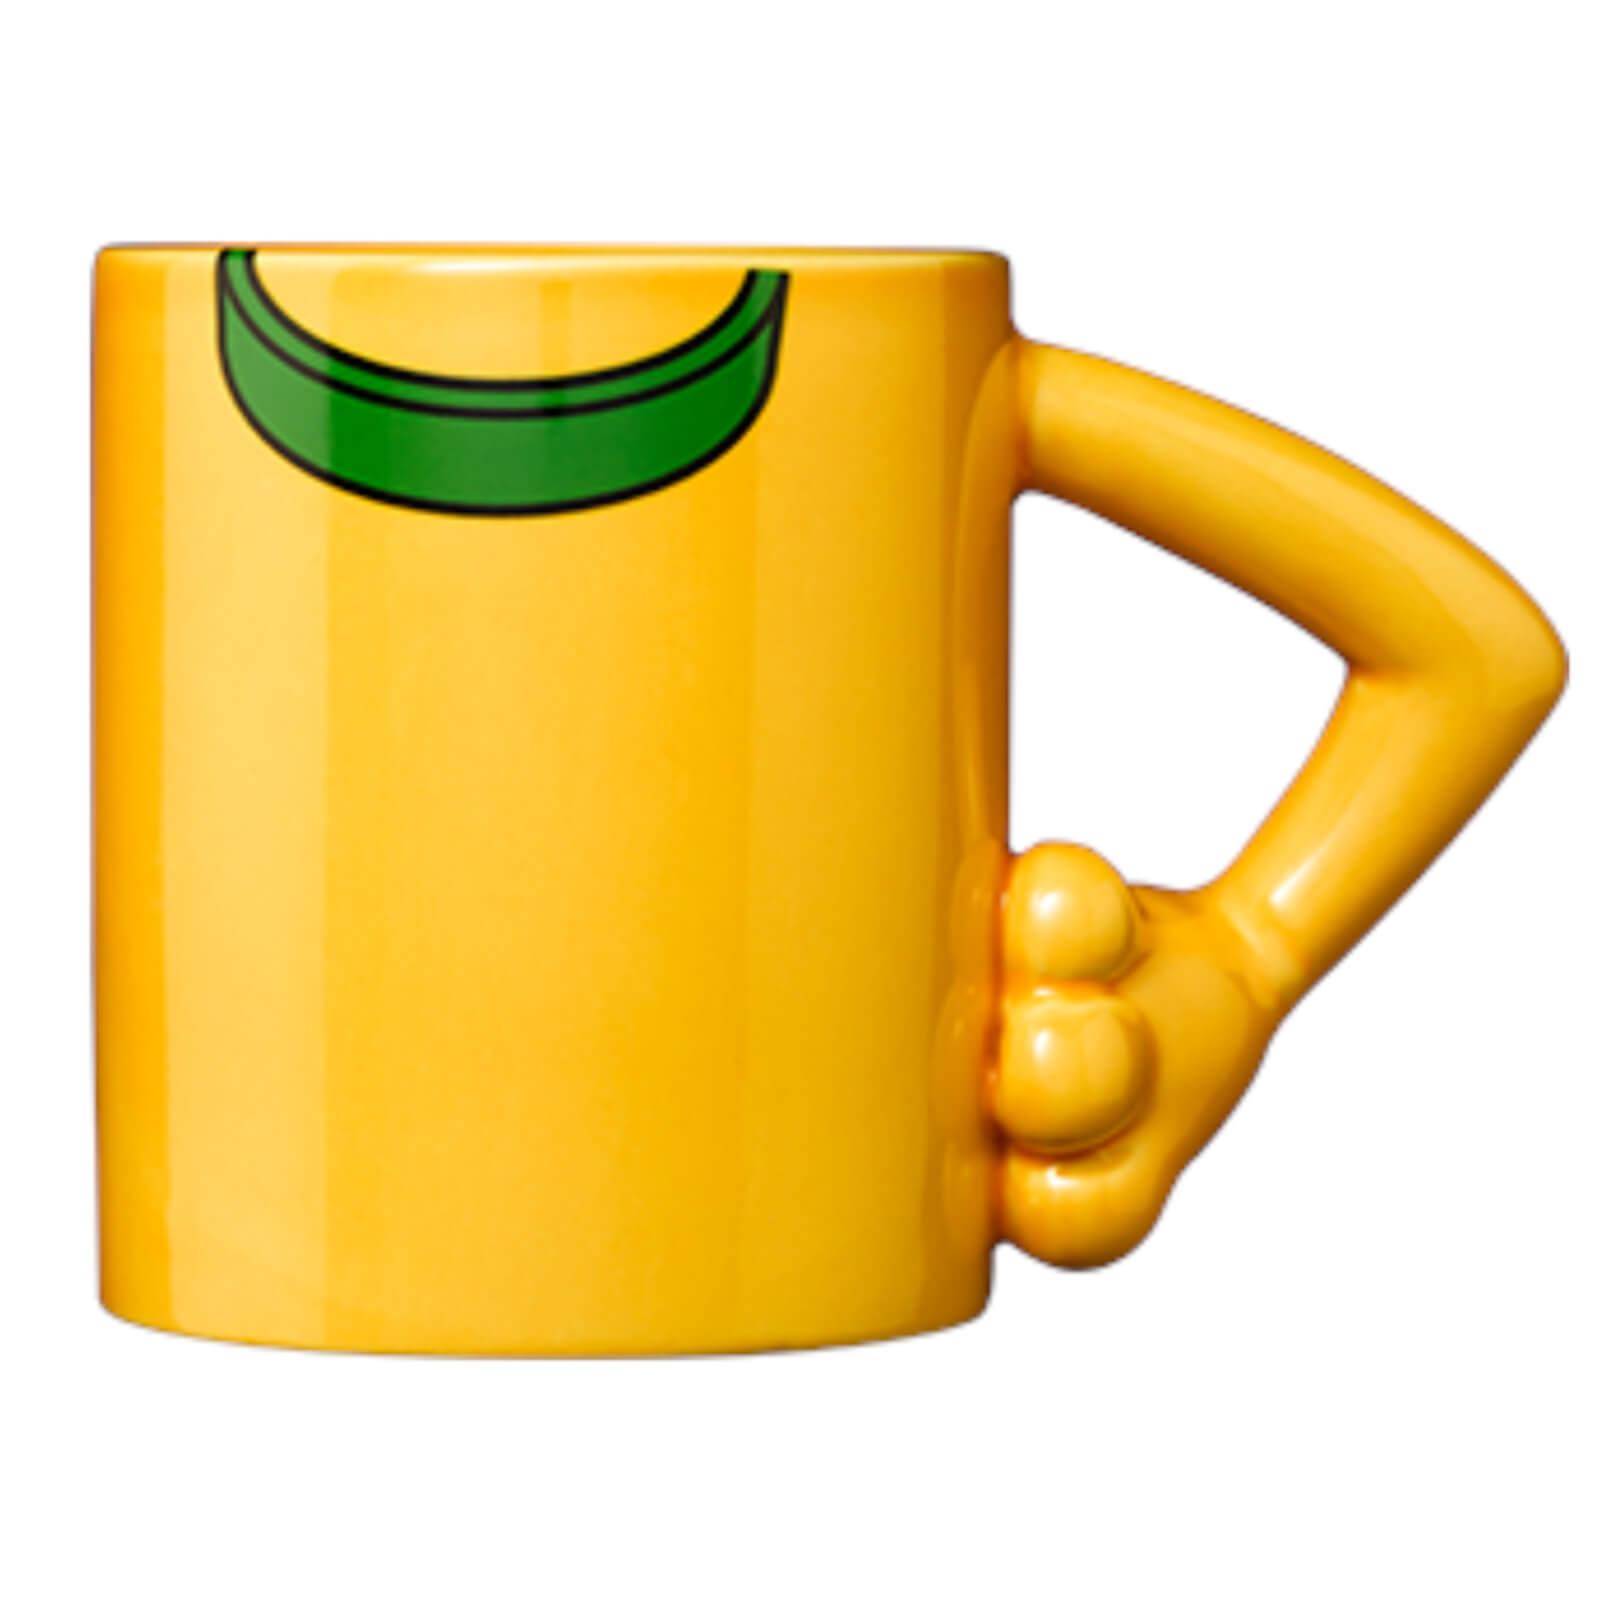 Image of Meta Merch Disney Pluto Arm Mug